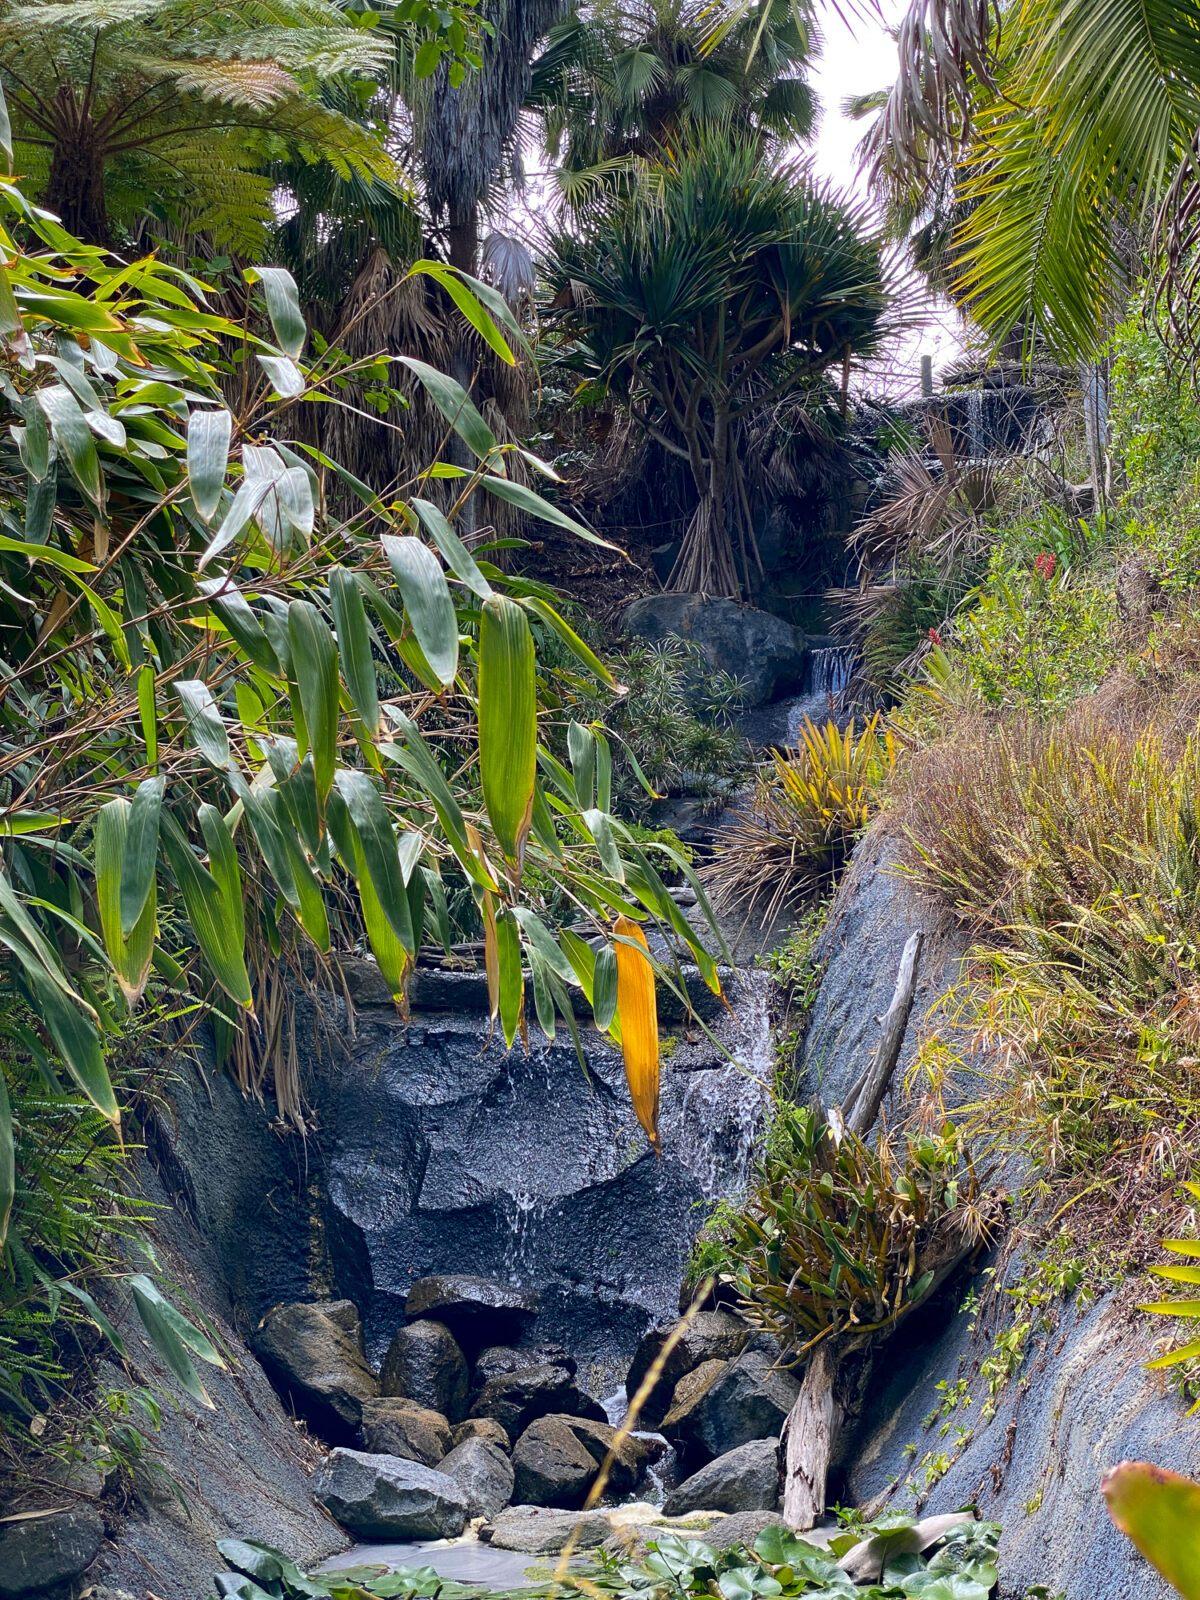 A waterfall in the San Diego Botanic Garden's Tropical Rainforest